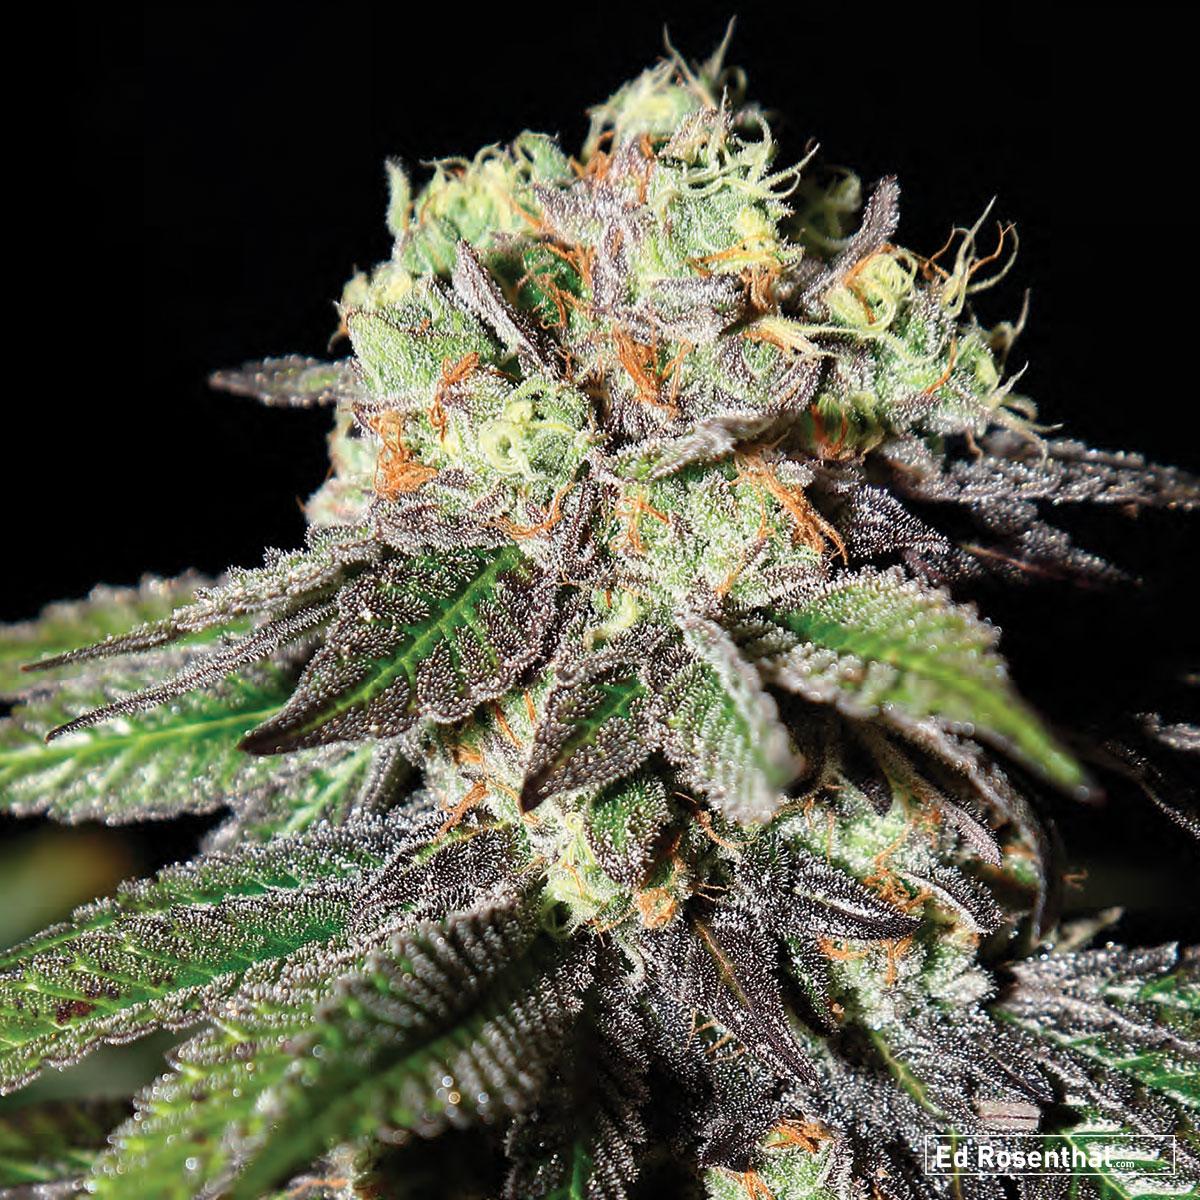 Strain Hunters Seed Bank - 70 S / 30 I - Trippy, stony, intense - Fruity, metallic